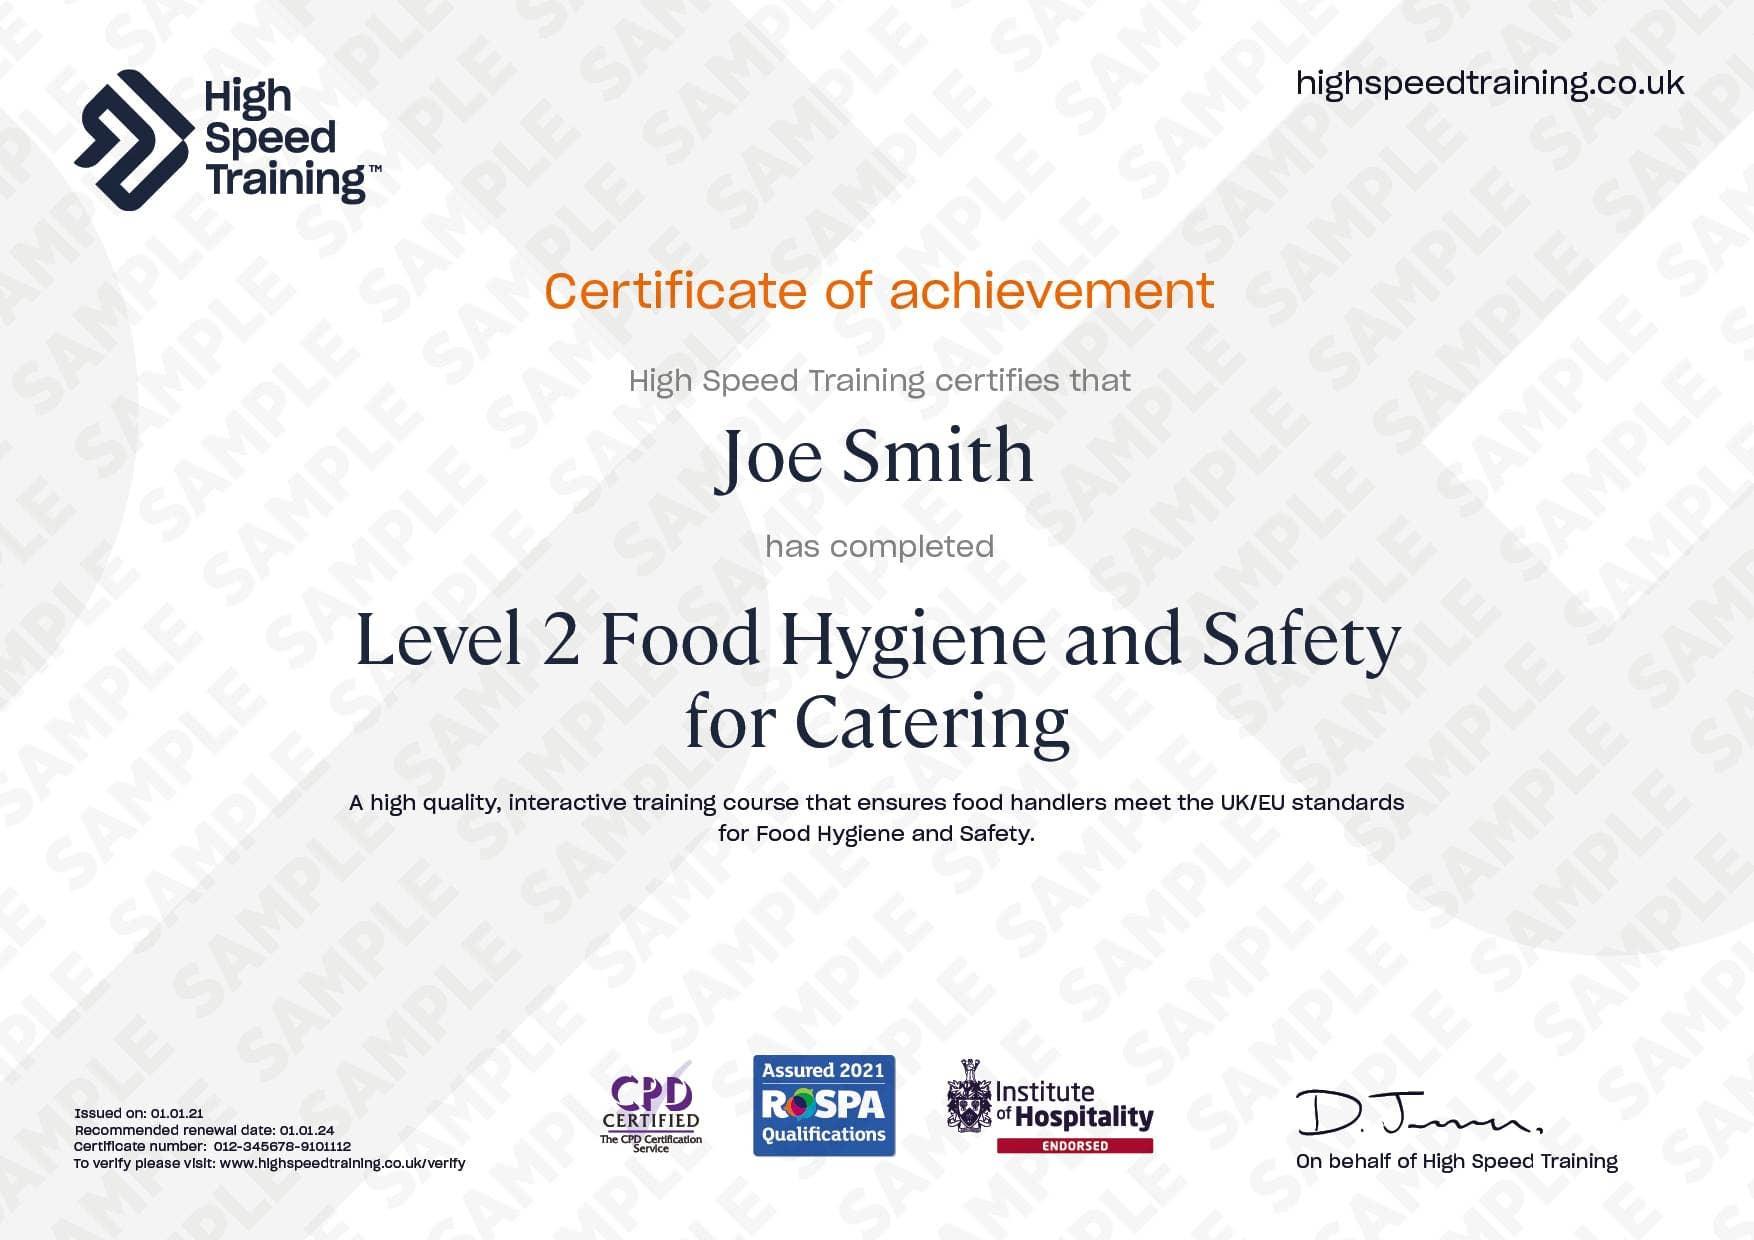 Verified Certificate